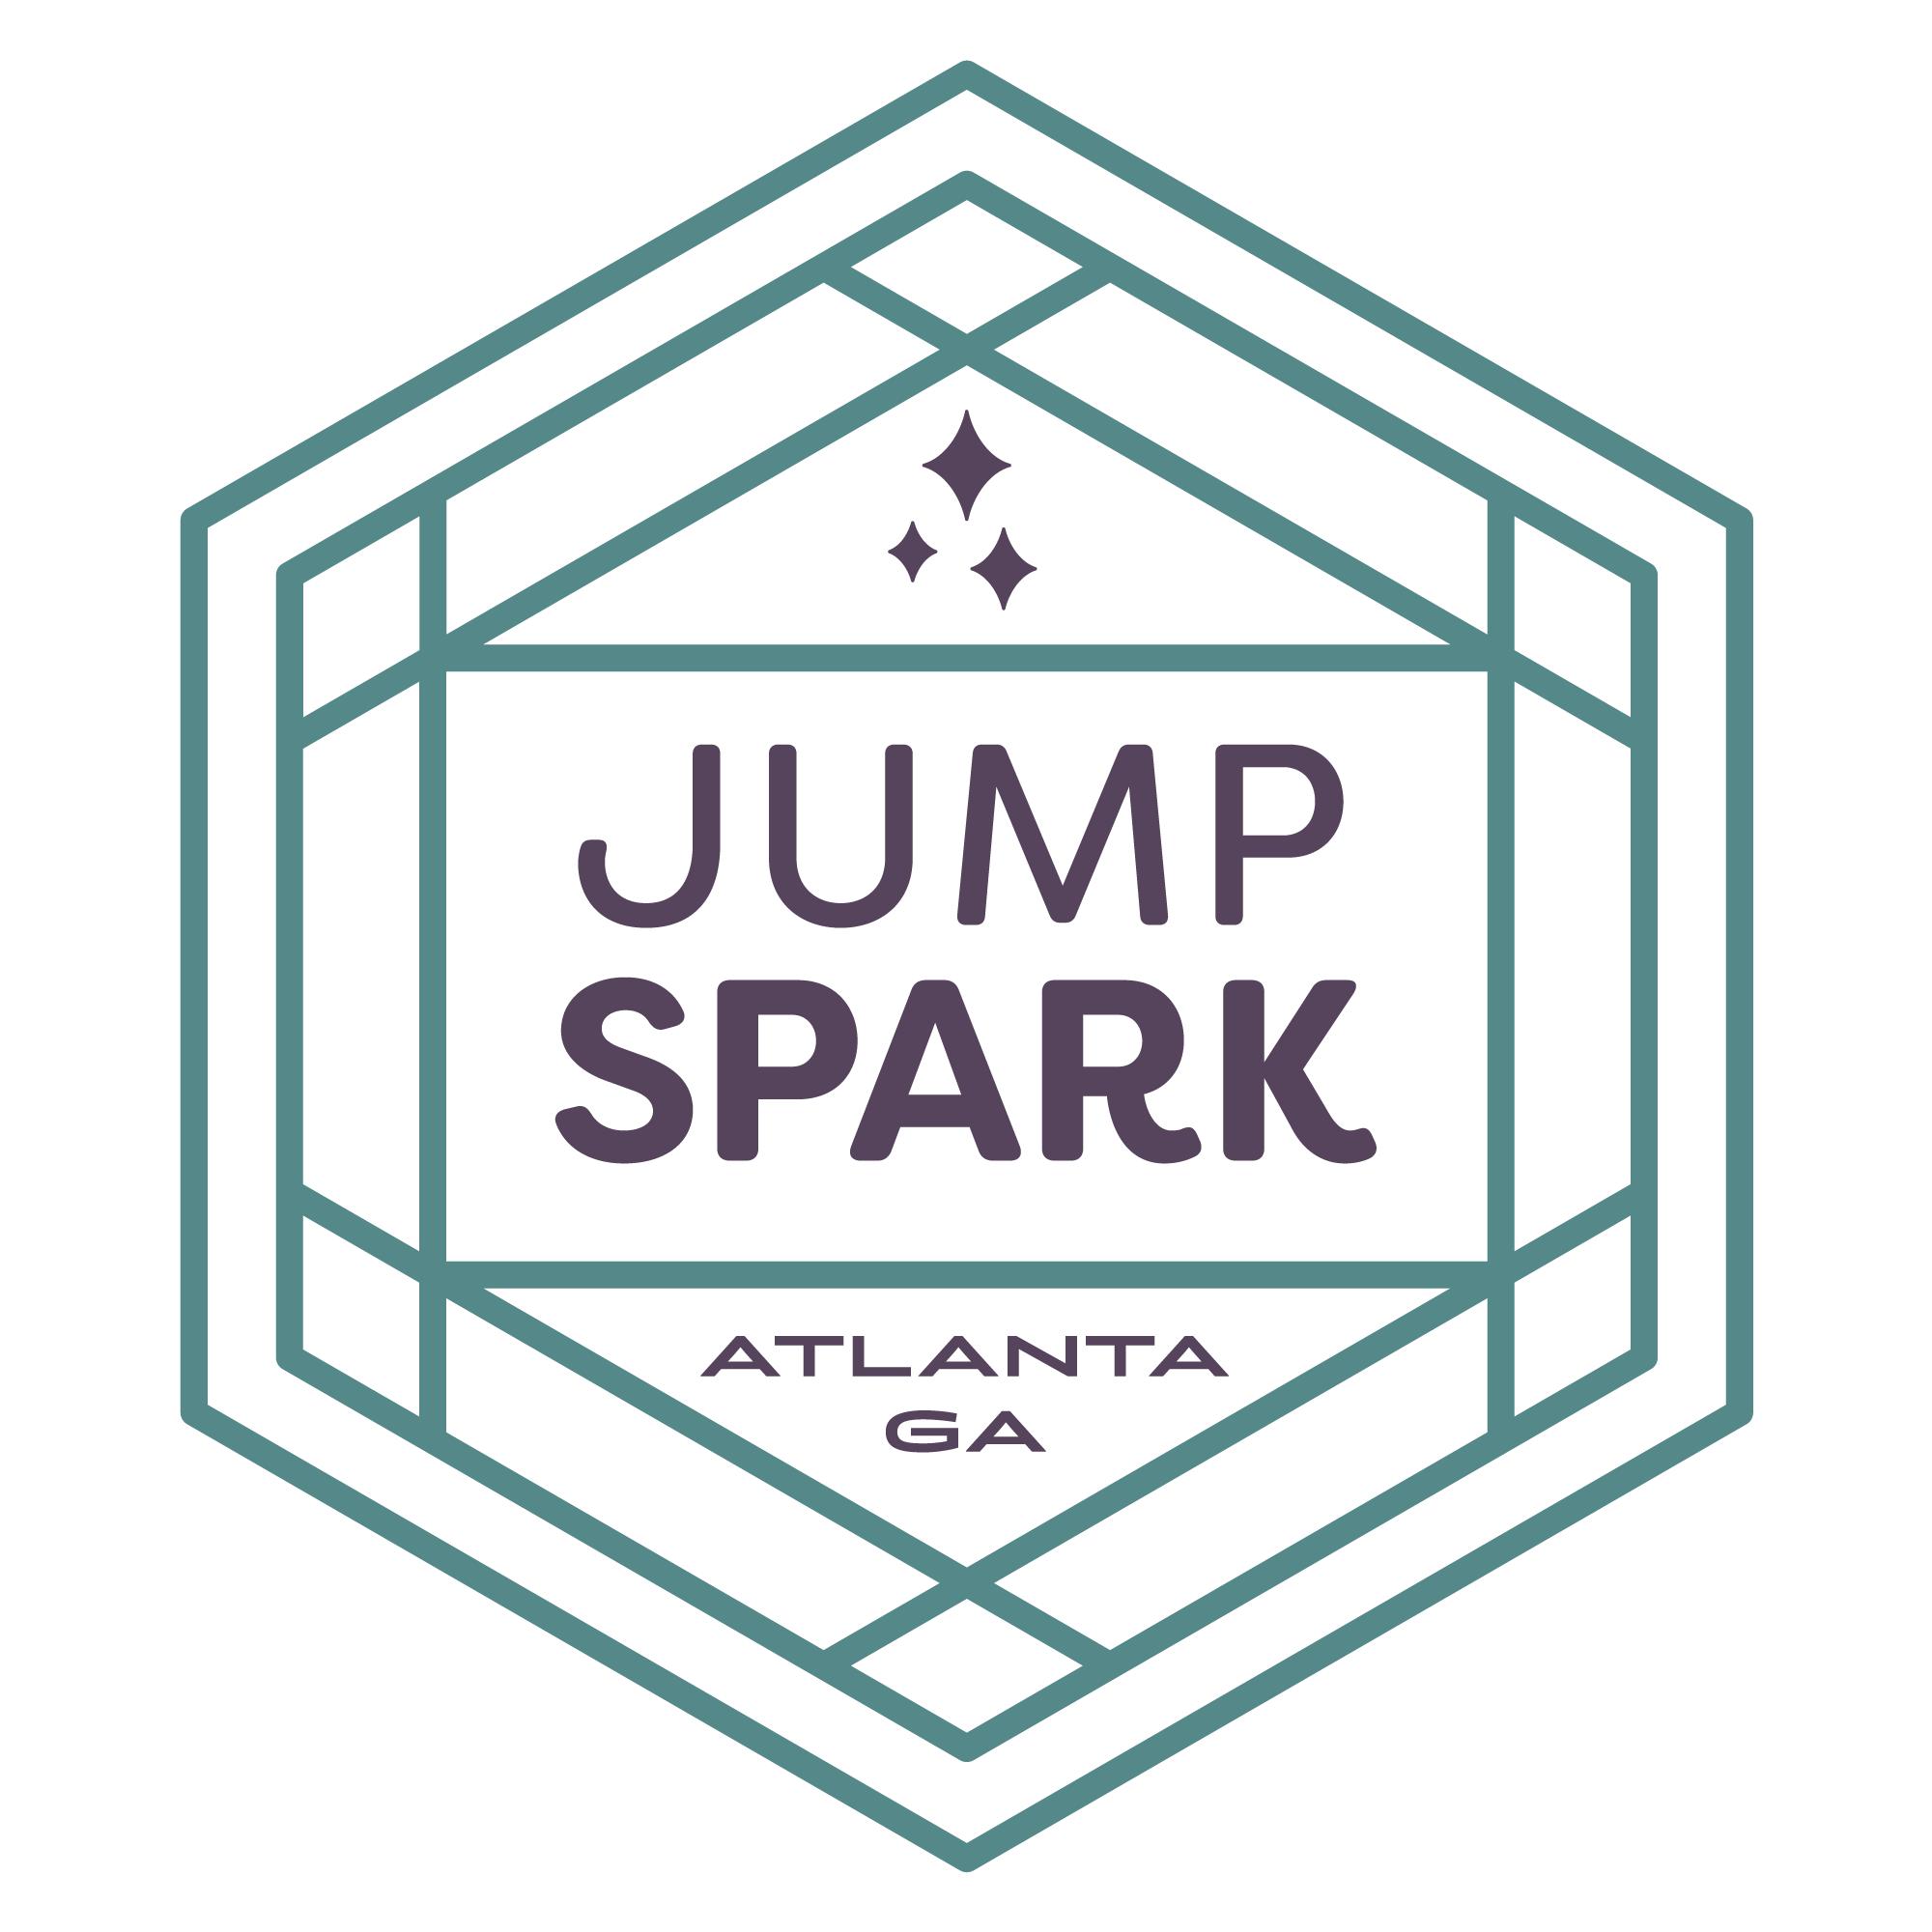 jumpsparkcolor.png